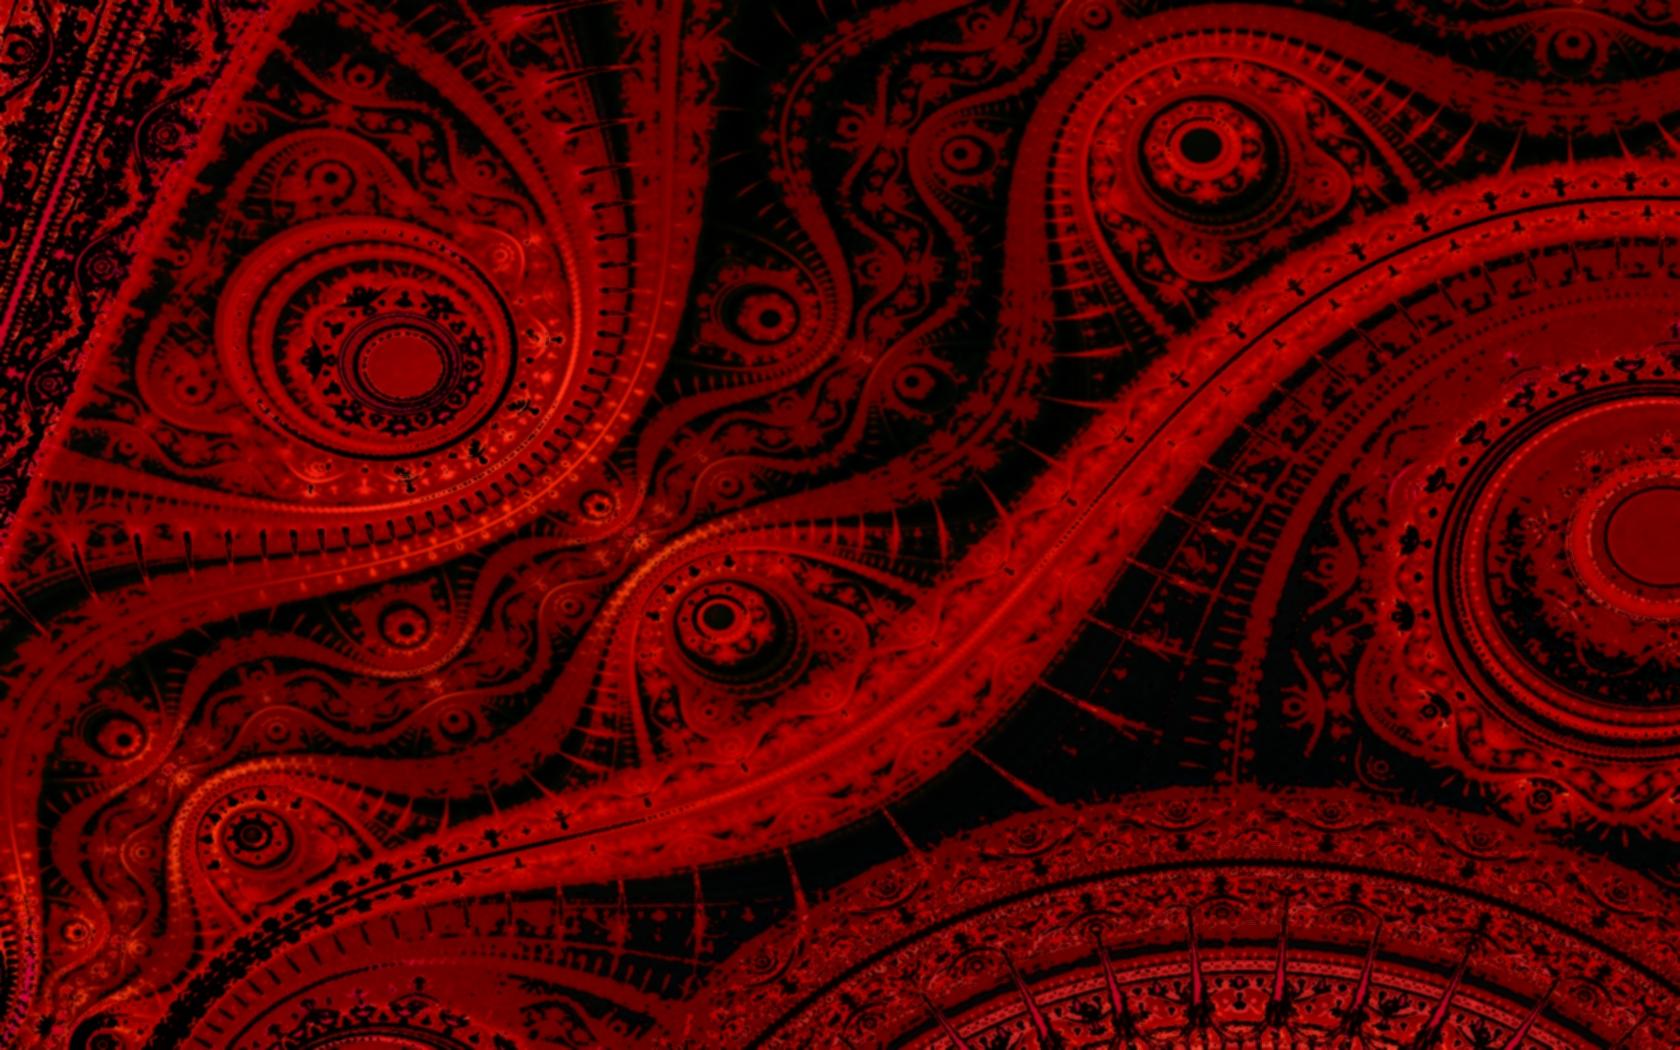 Red Wallpapers Abstract wallpaper wallpaper hd background desktop 1680x1050